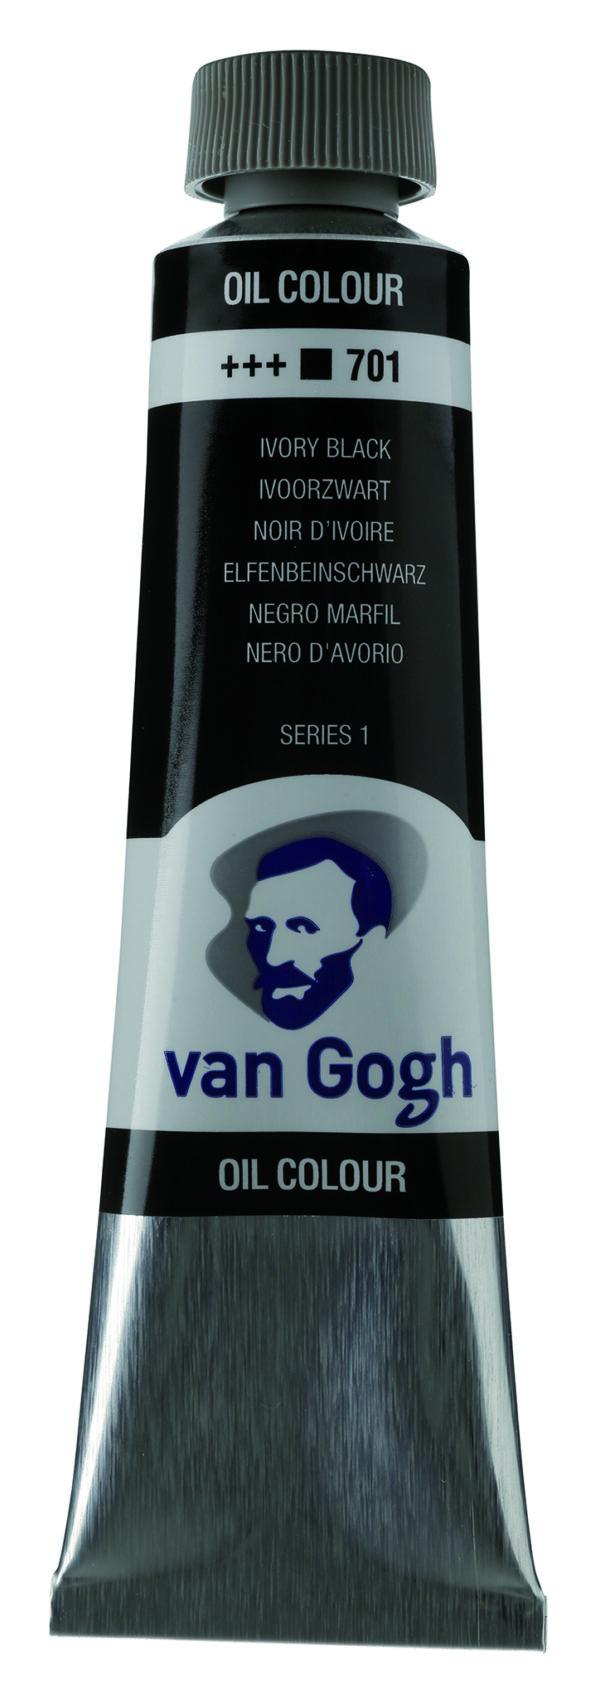 Van Gogh 701 Ivory black - 40 ml